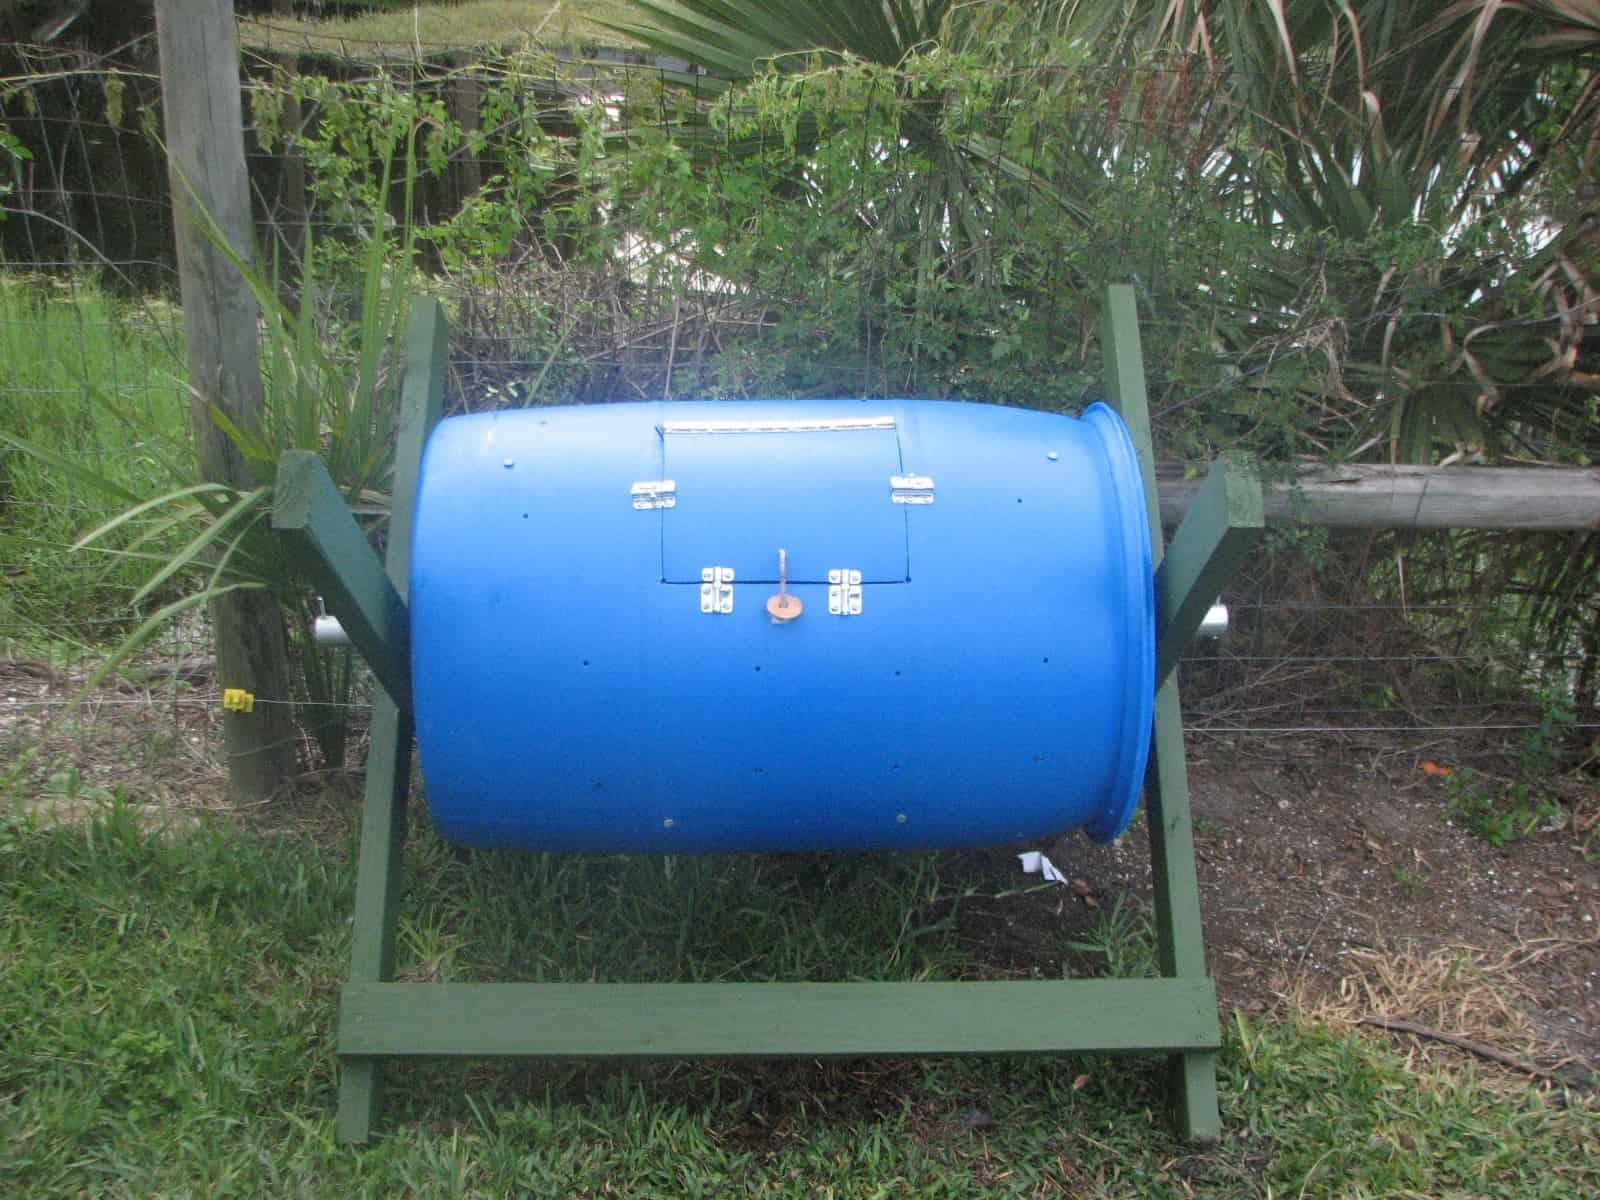 Plastic rain barrel compost bin in a frame